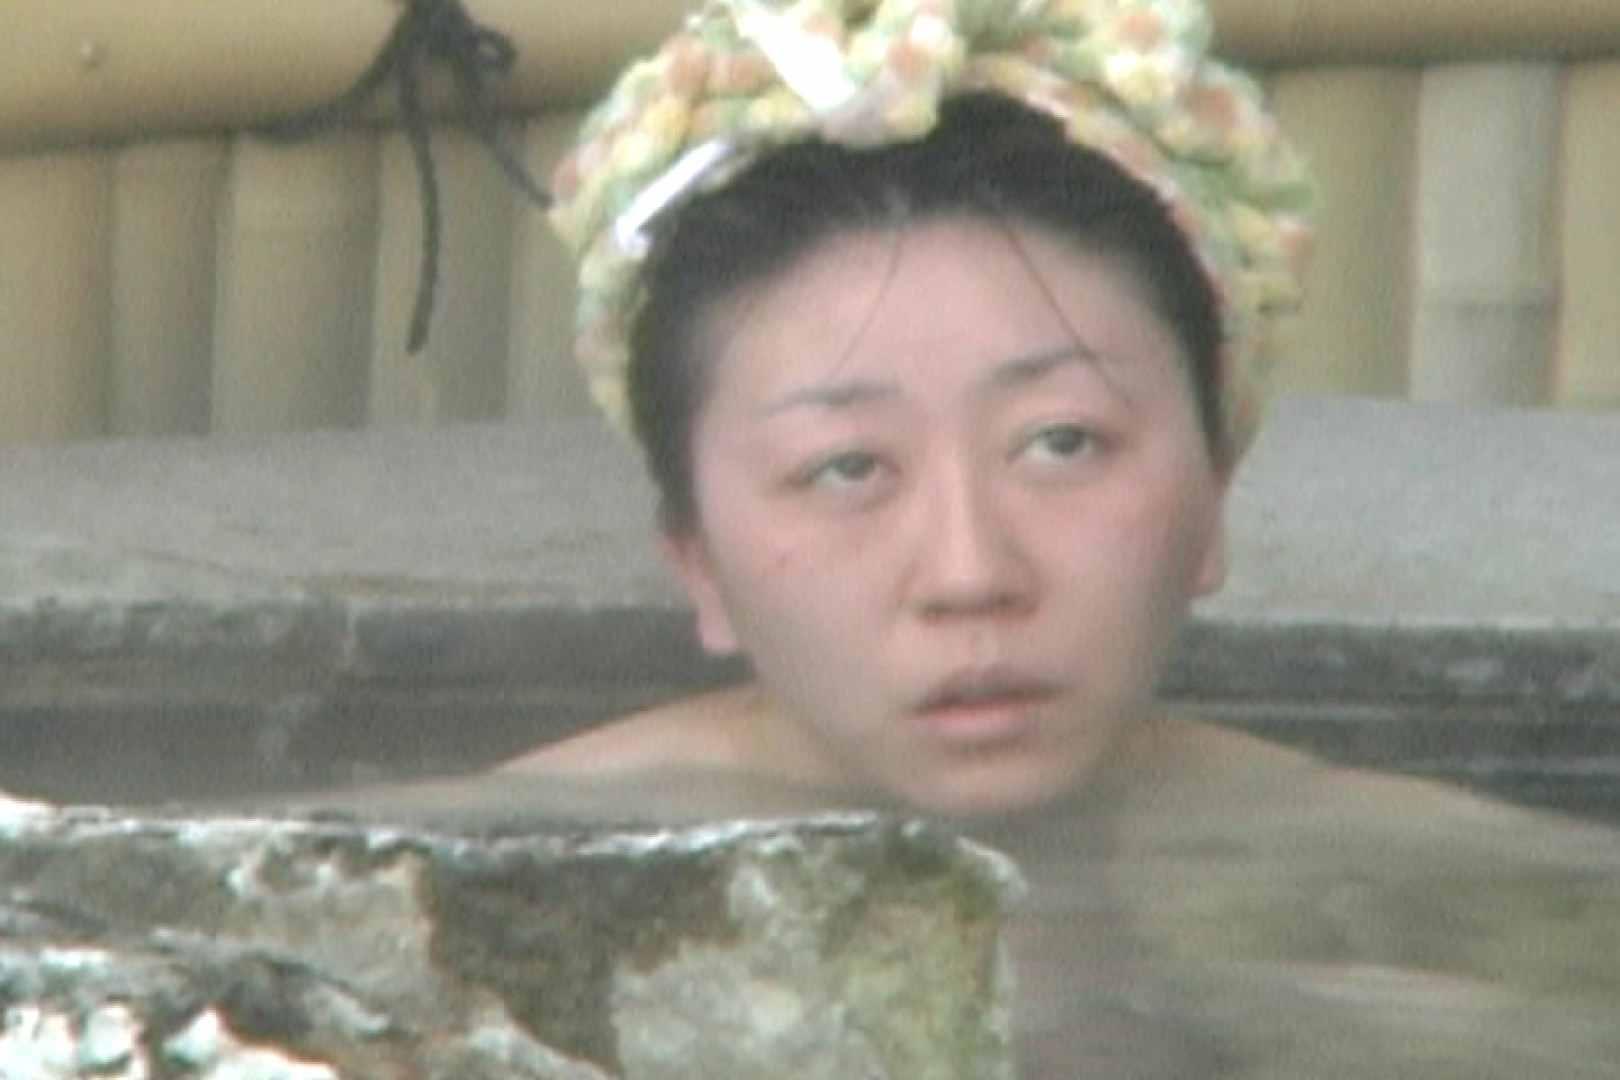 Aquaな露天風呂Vol.594 盗撮師作品  79pic 54